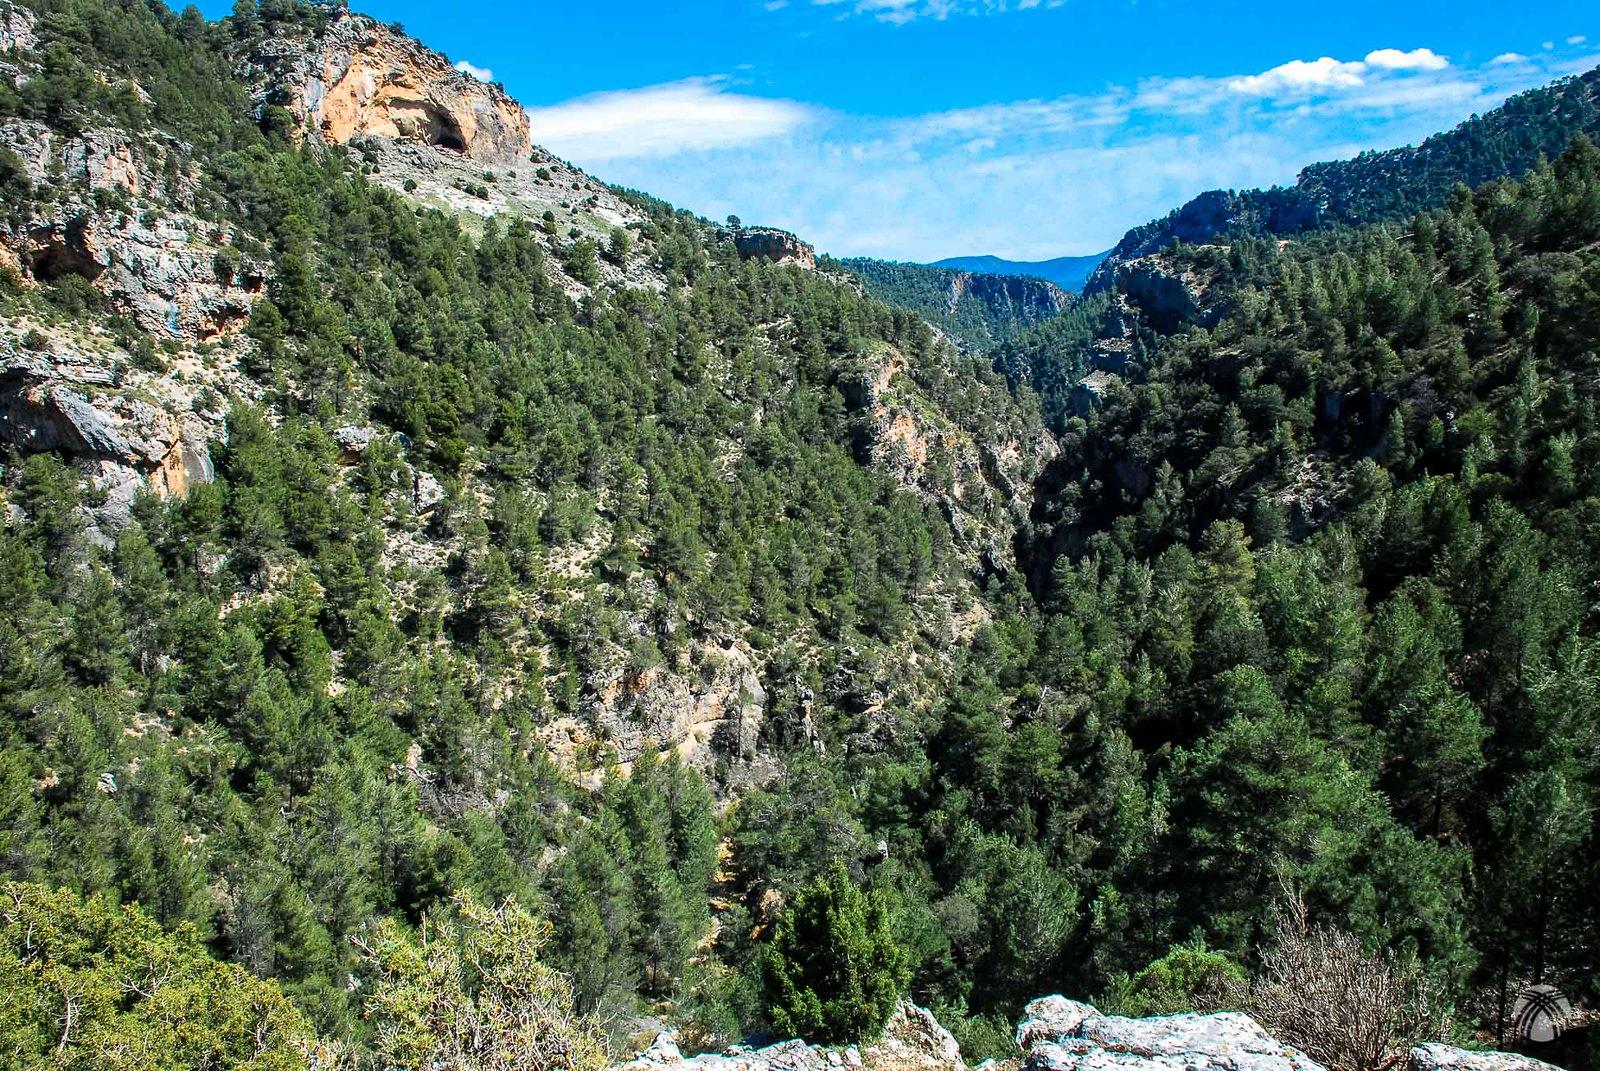 Vista general del cañón